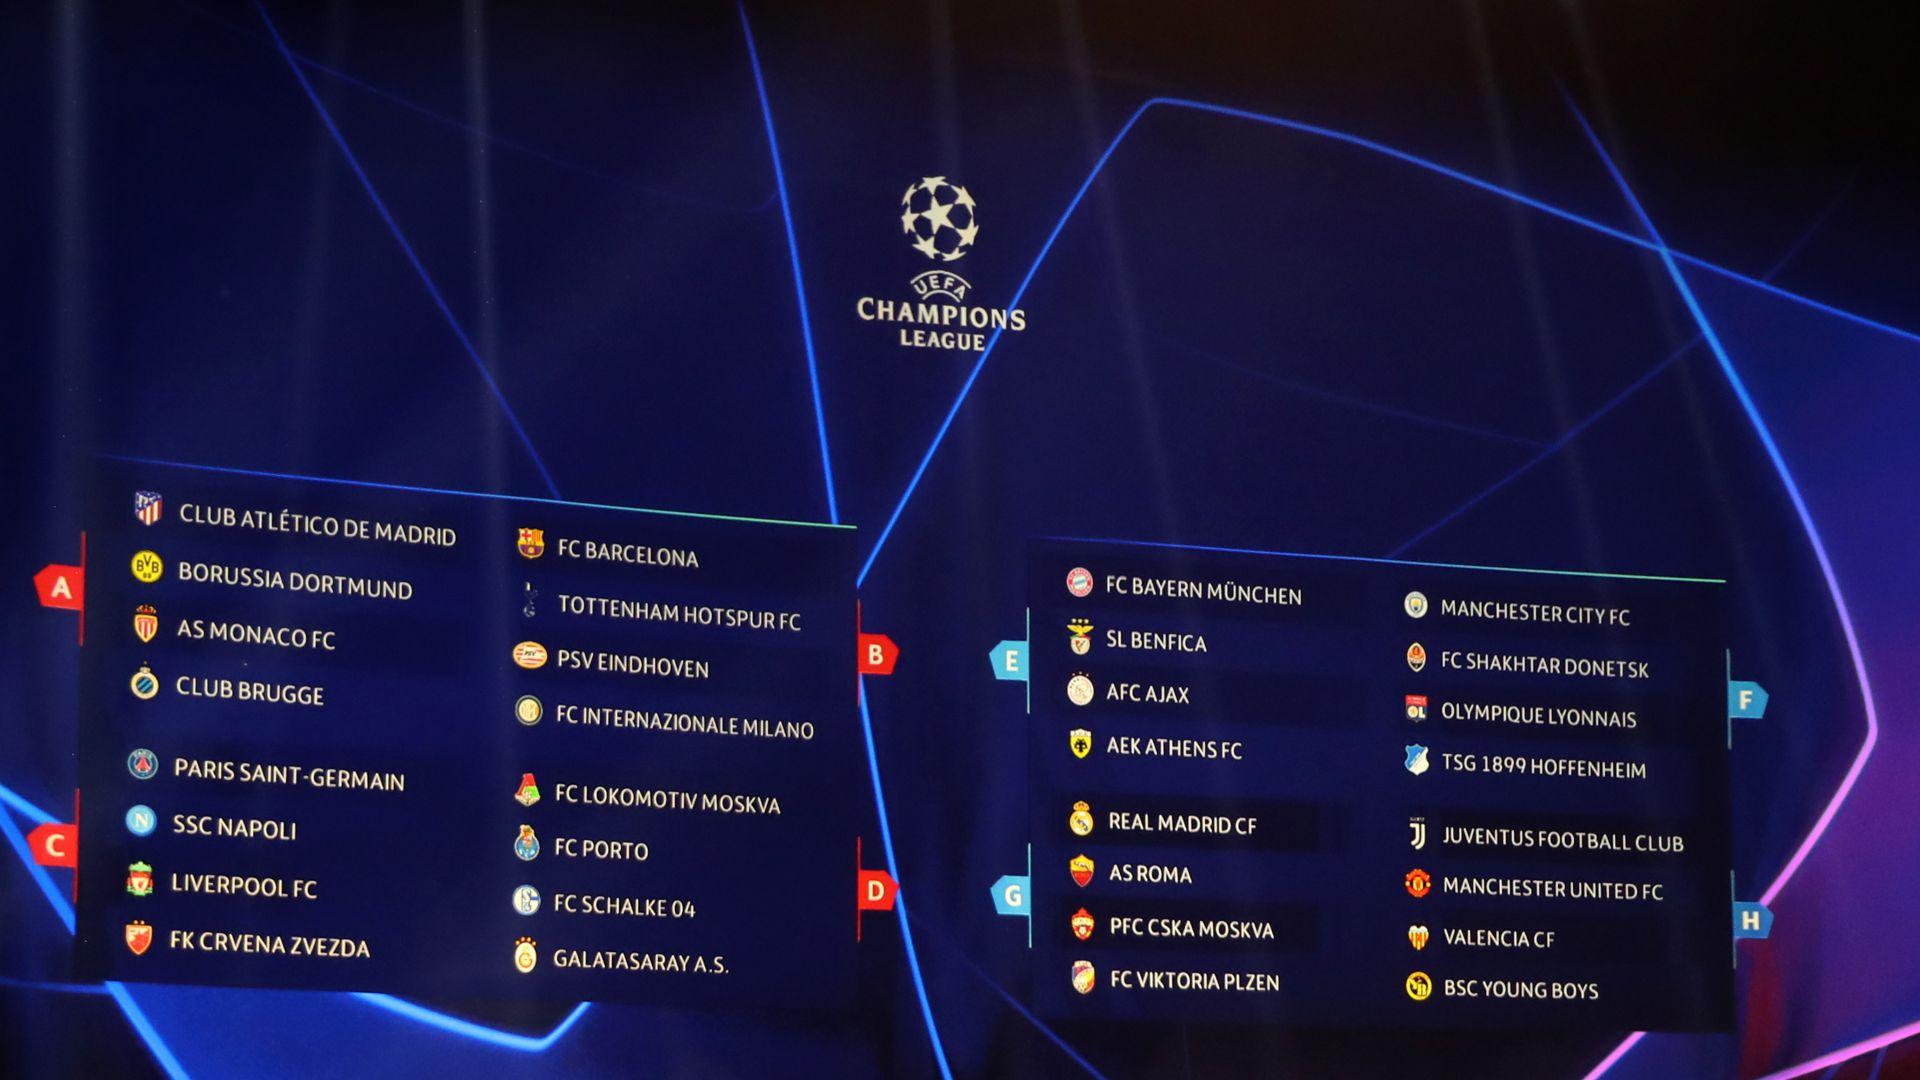 Roma Calendario Europa League.Gironi Champions League 2018 2019 Calendario Risultati E